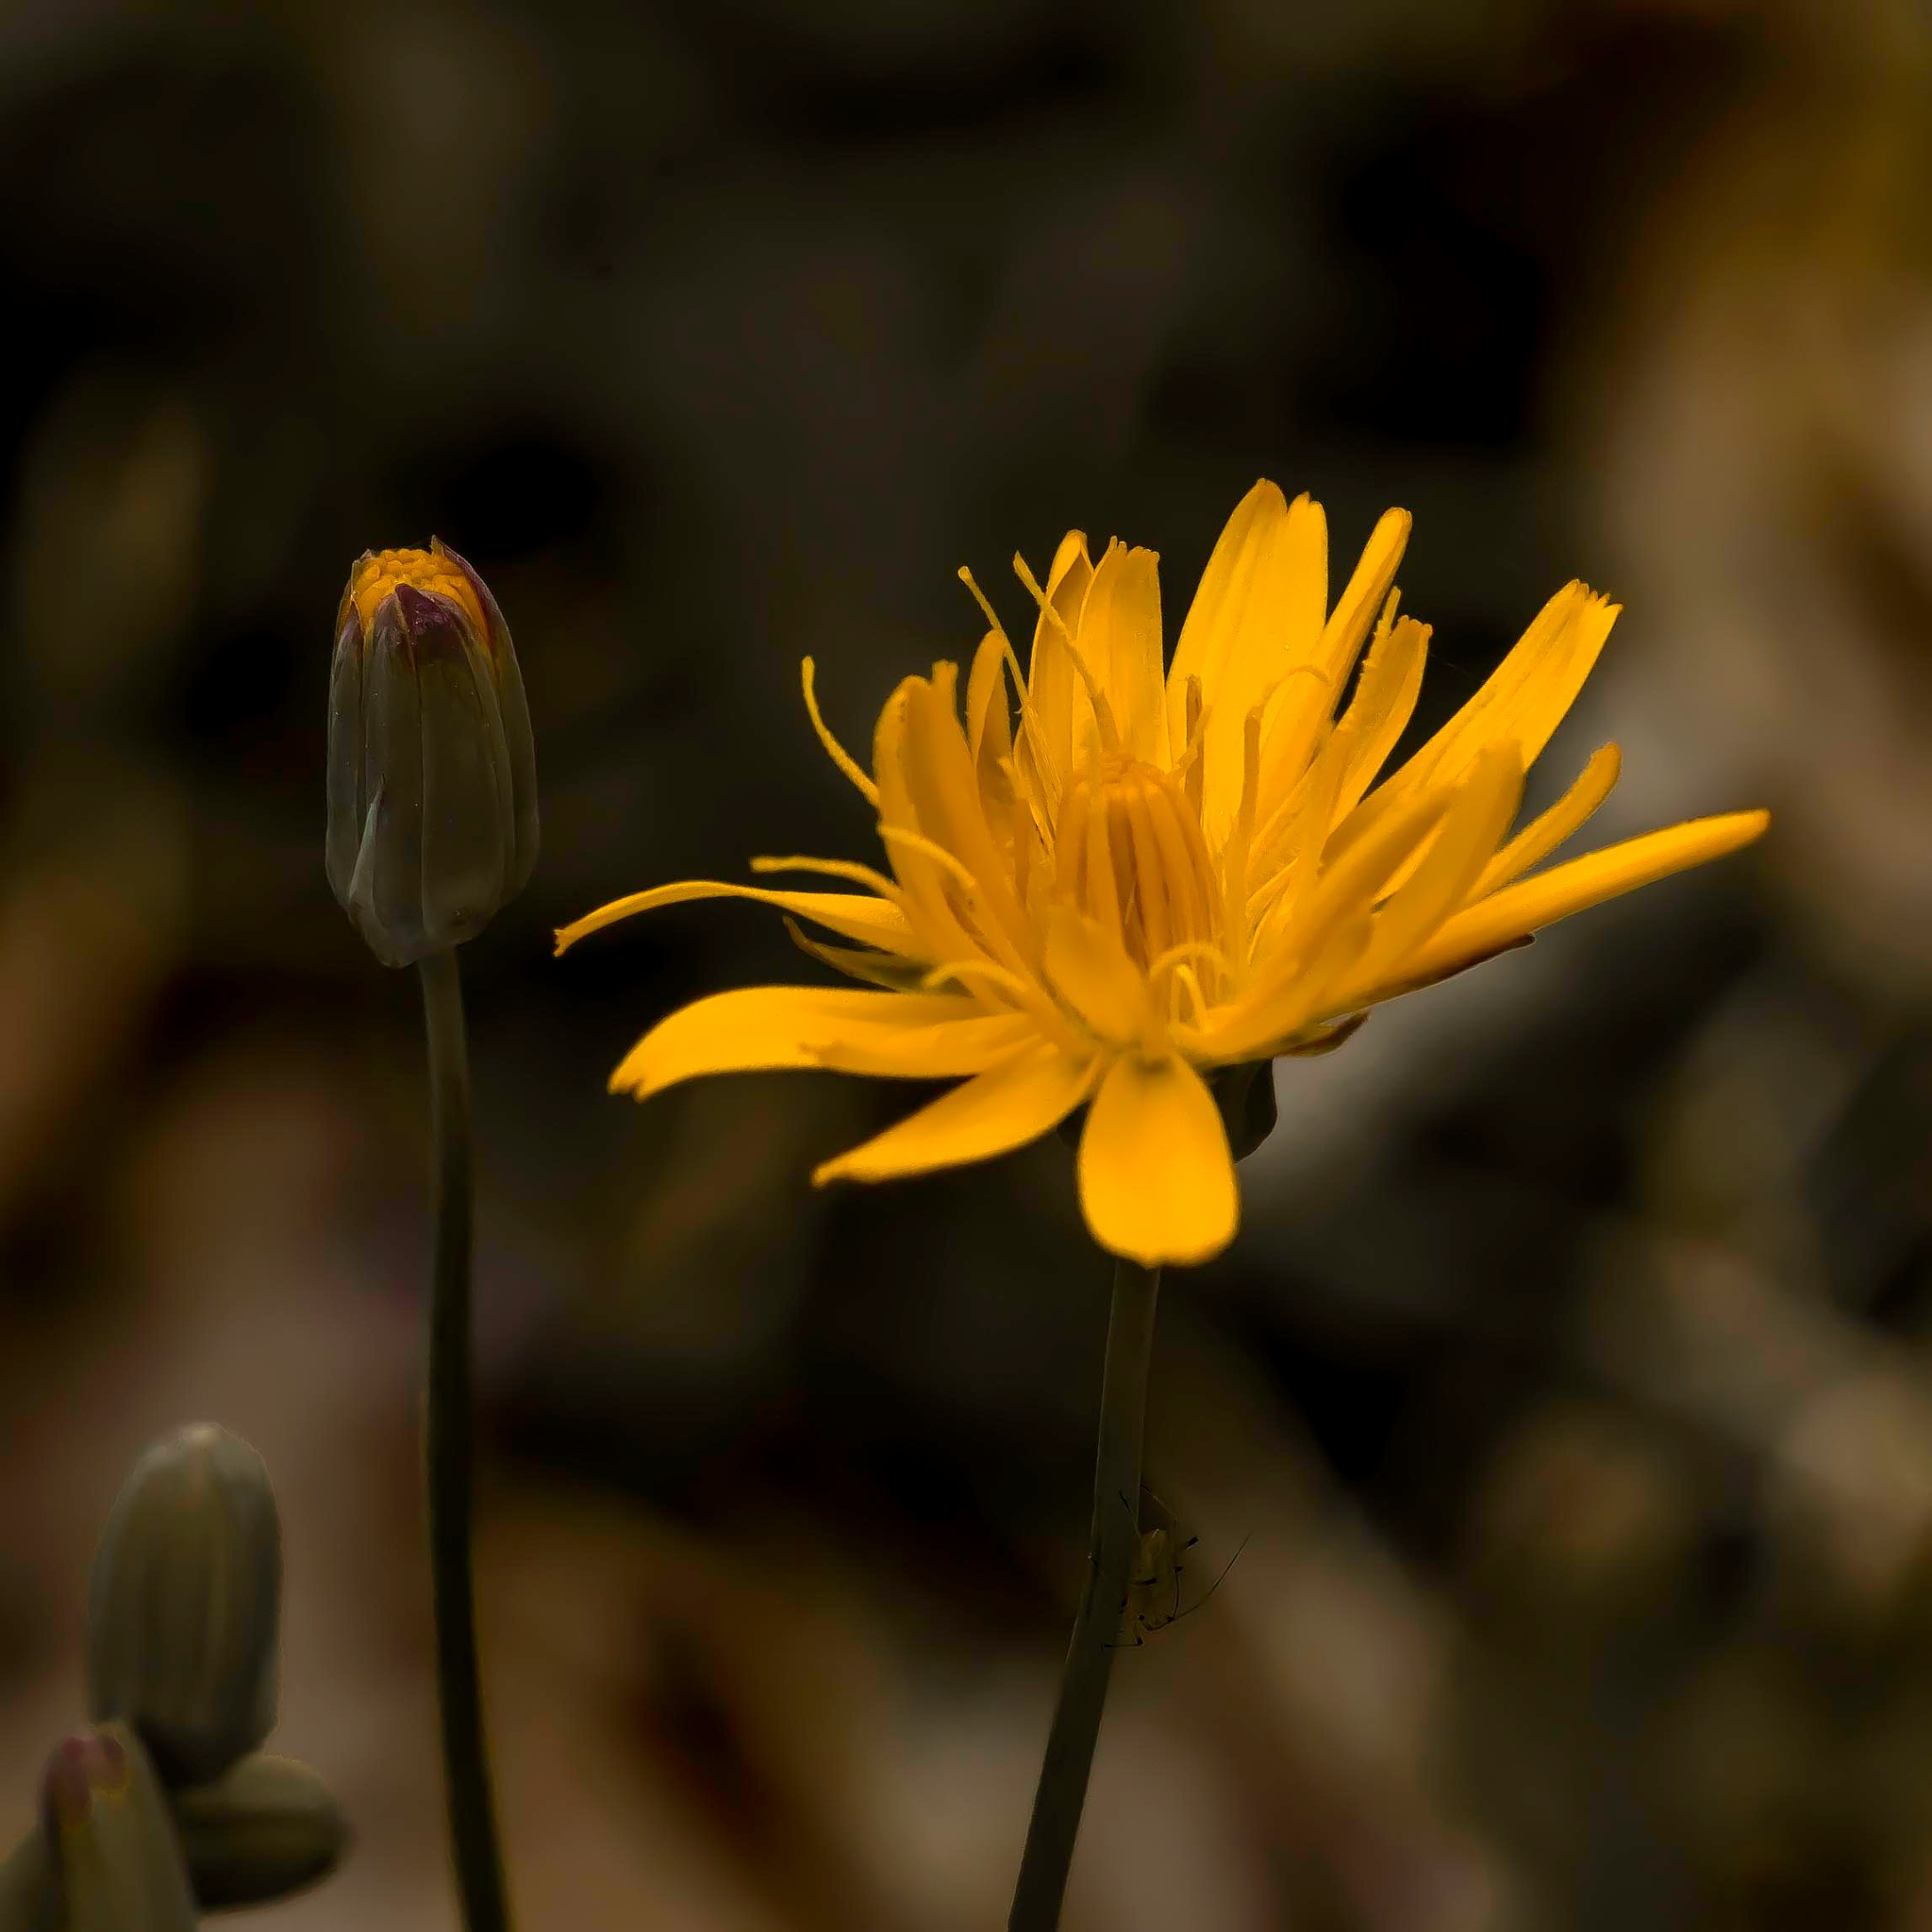 Wildflower In Golden Light by Edward Brown